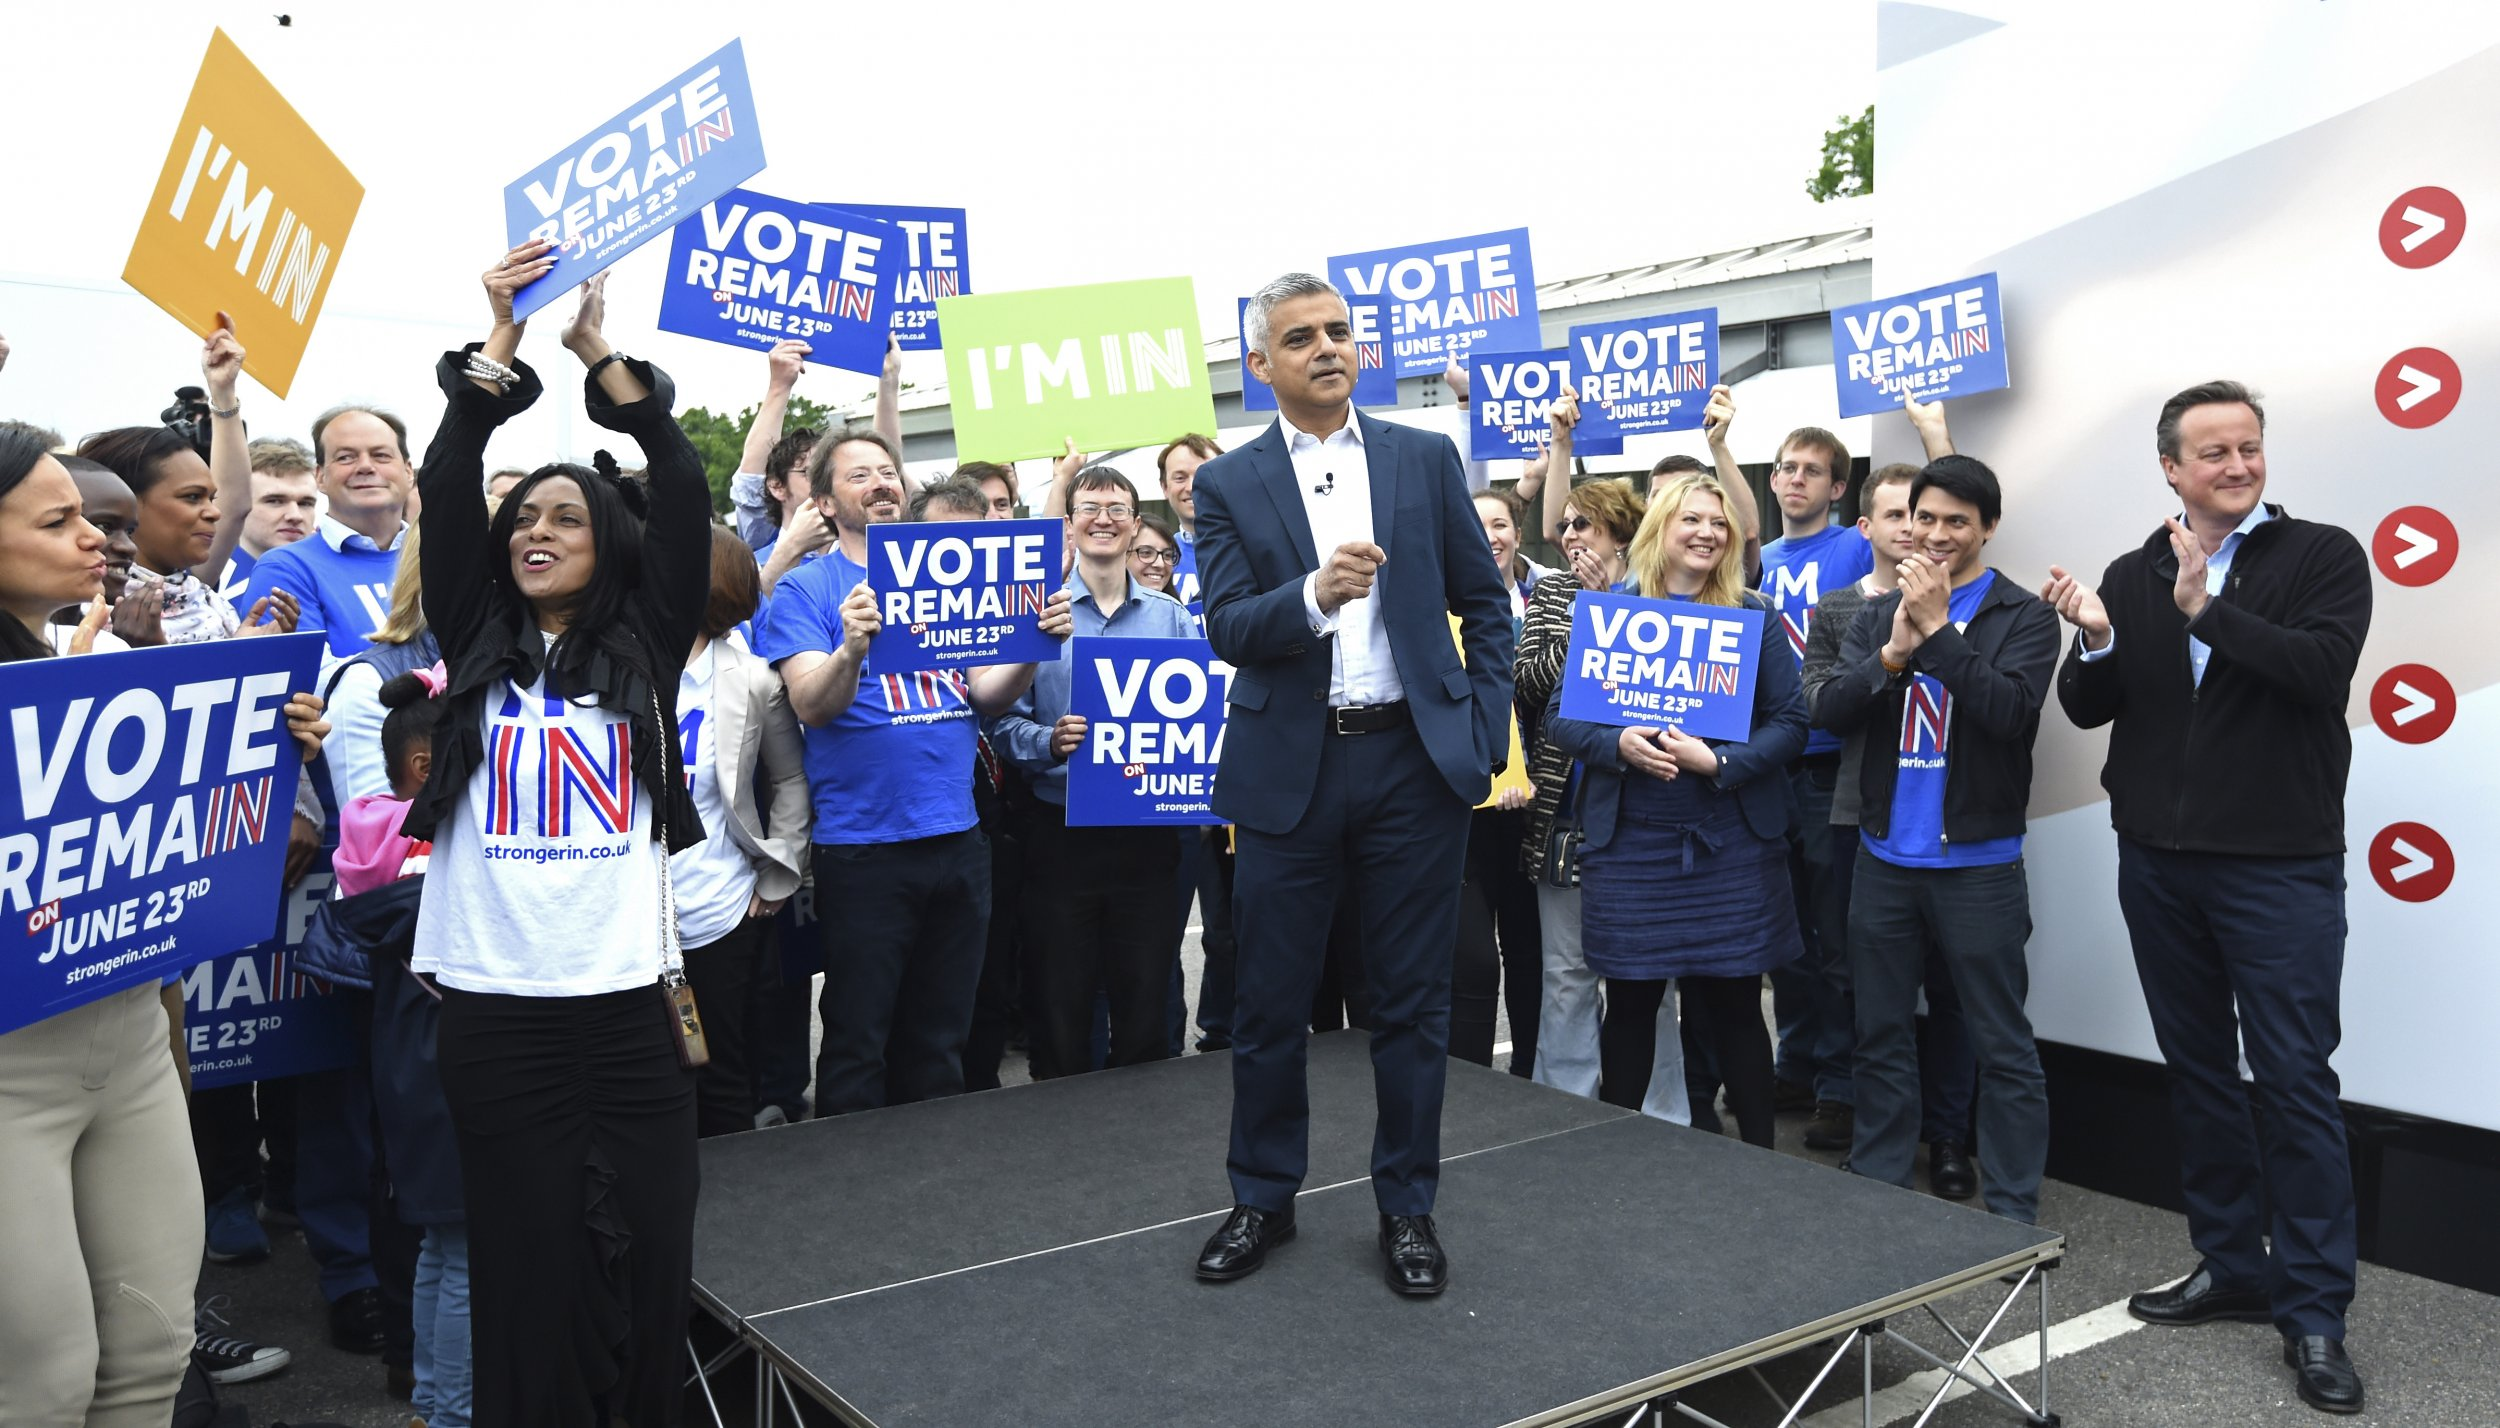 David Cameron and Sadiq Khan, Remain